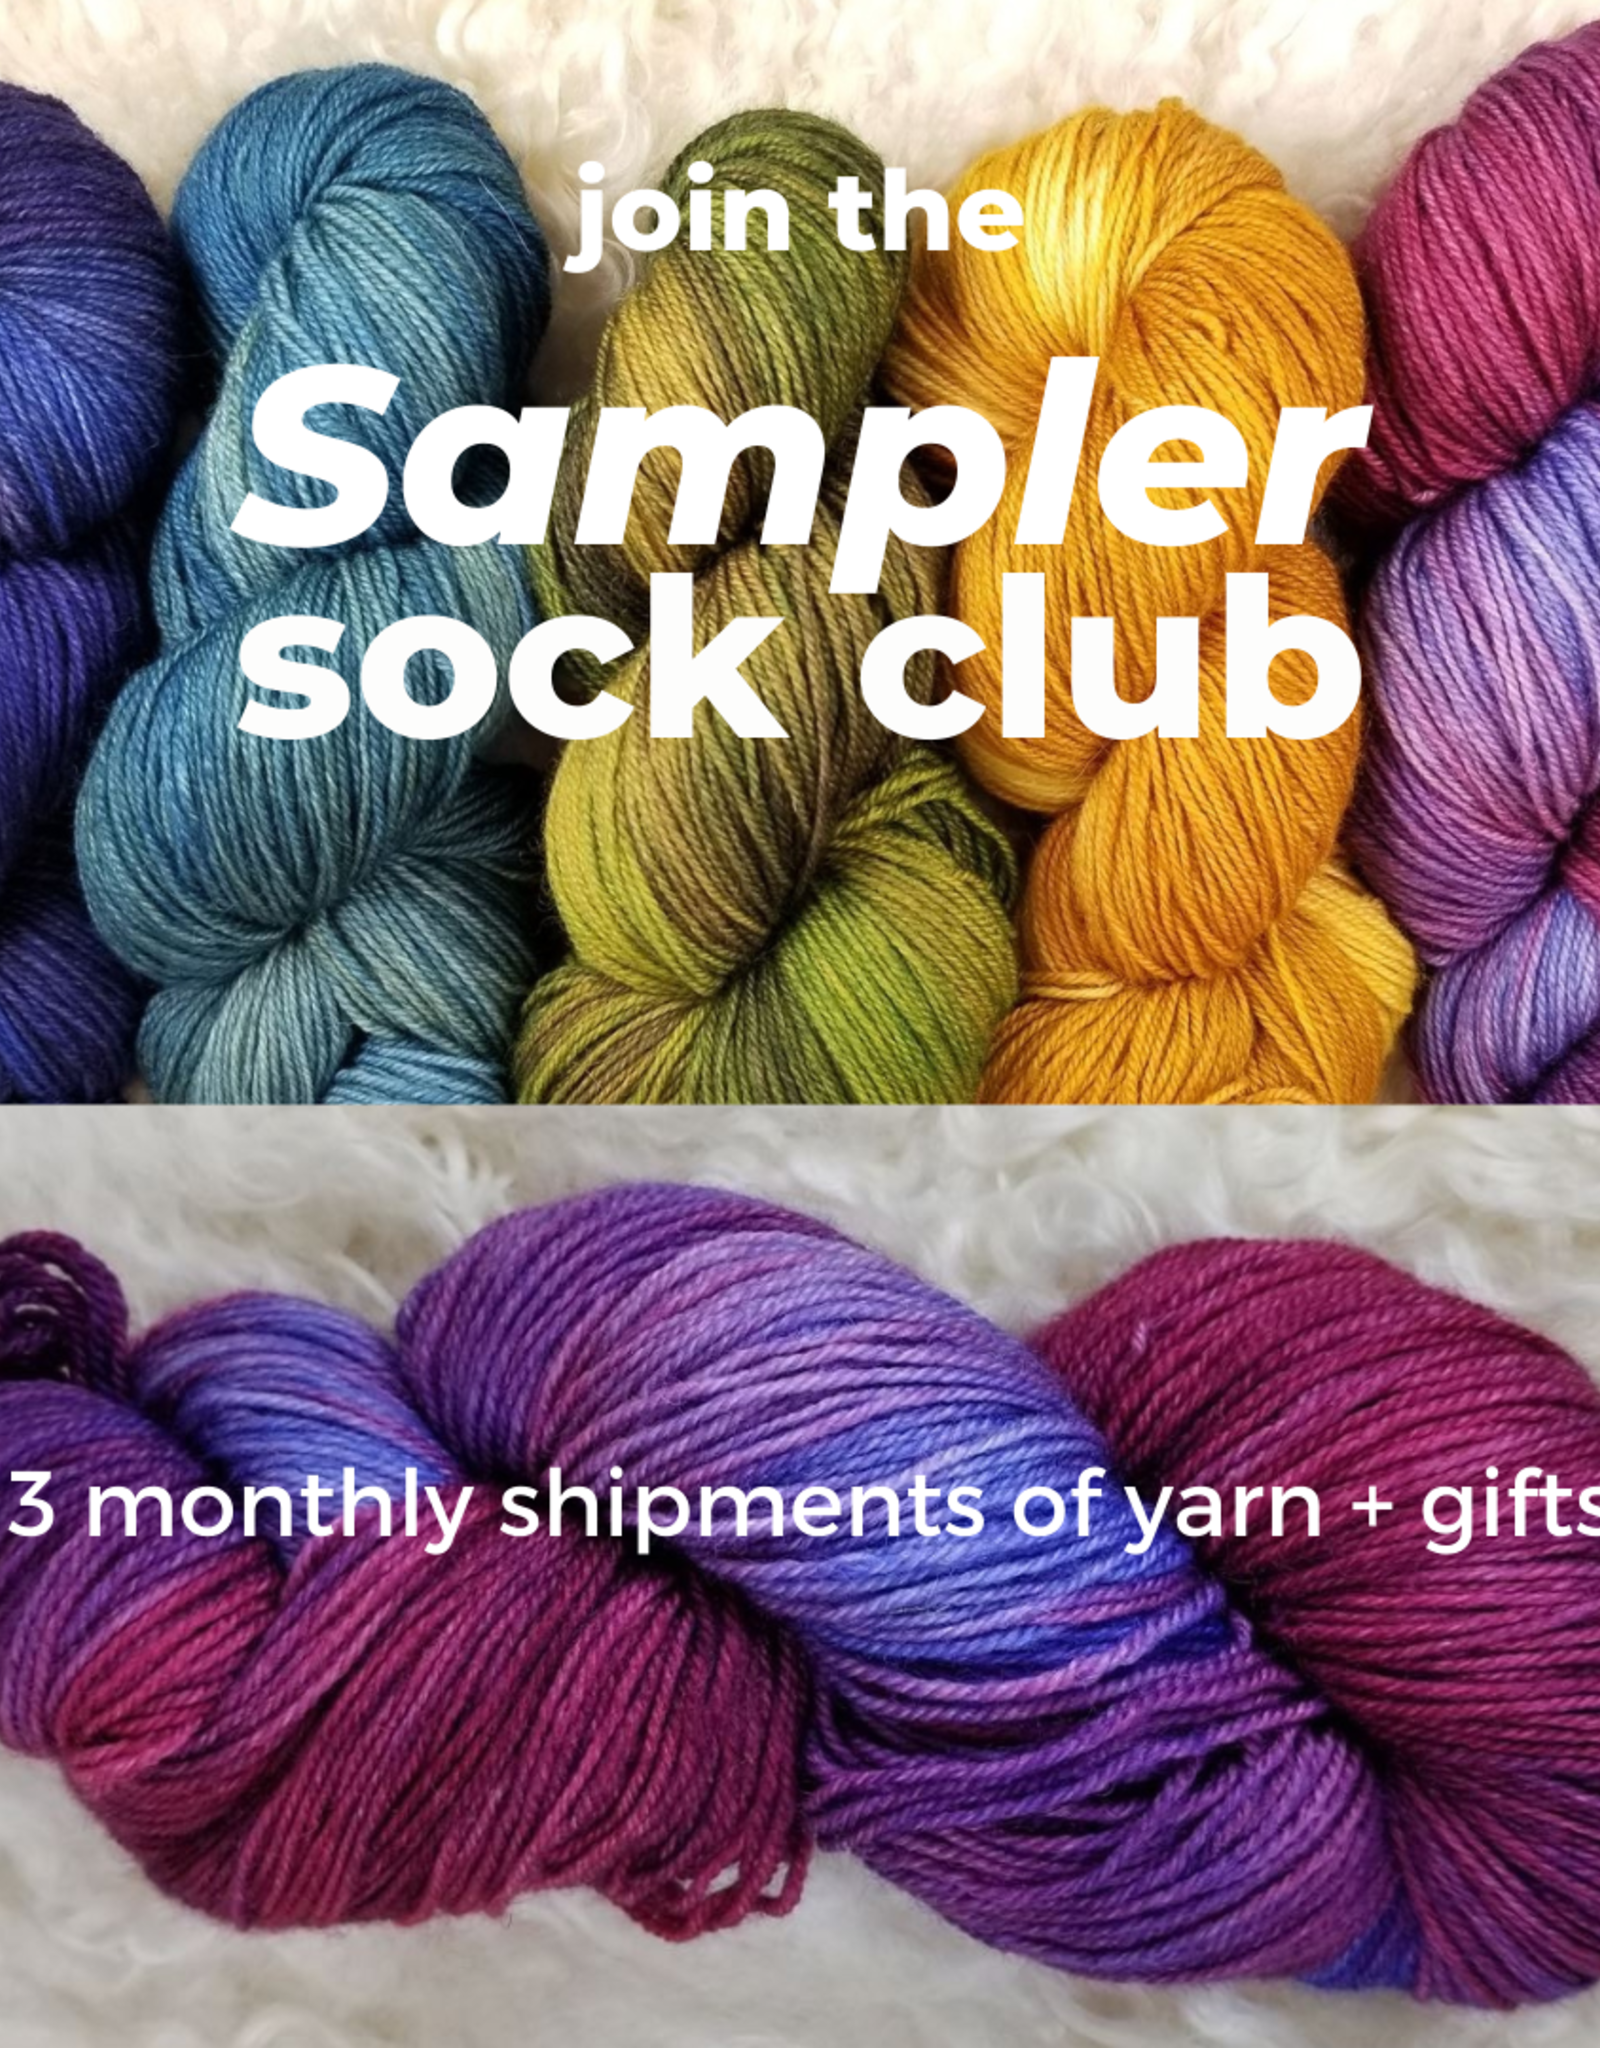 Palouse Yarn Co Sampler SOCK CLUB!